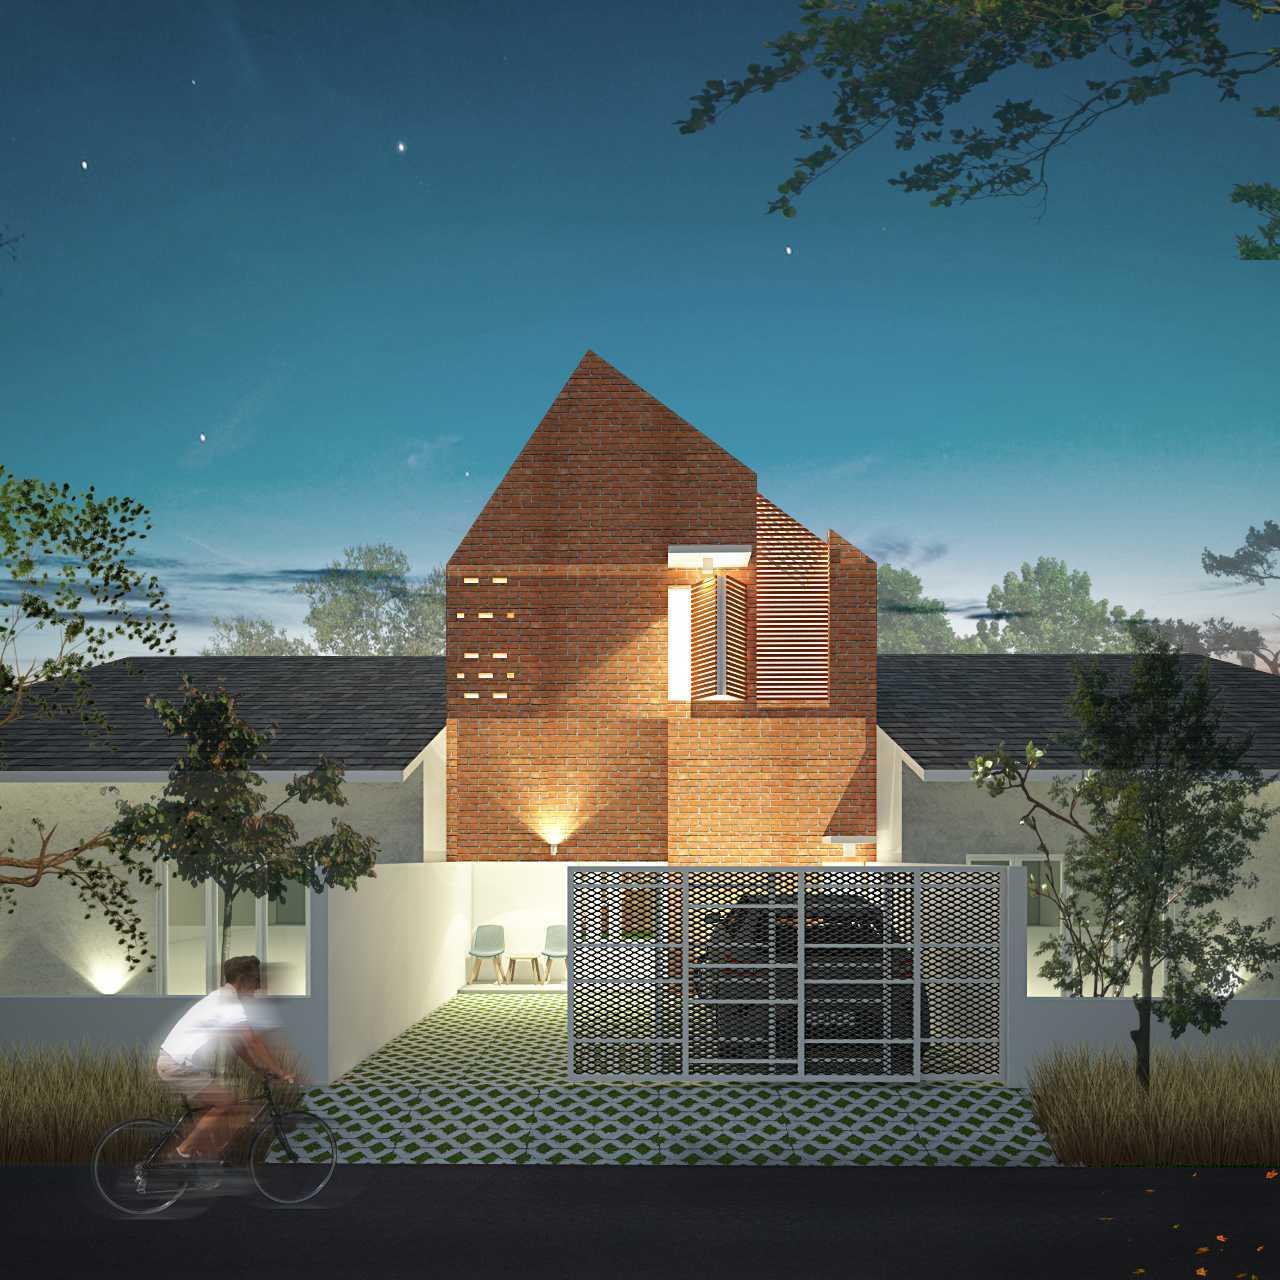 Sekala 6X15 House Kota Sby, Jawa Timur, Indonesia Kota Sby, Jawa Timur, Indonesia Front View Rendering Modern 38239